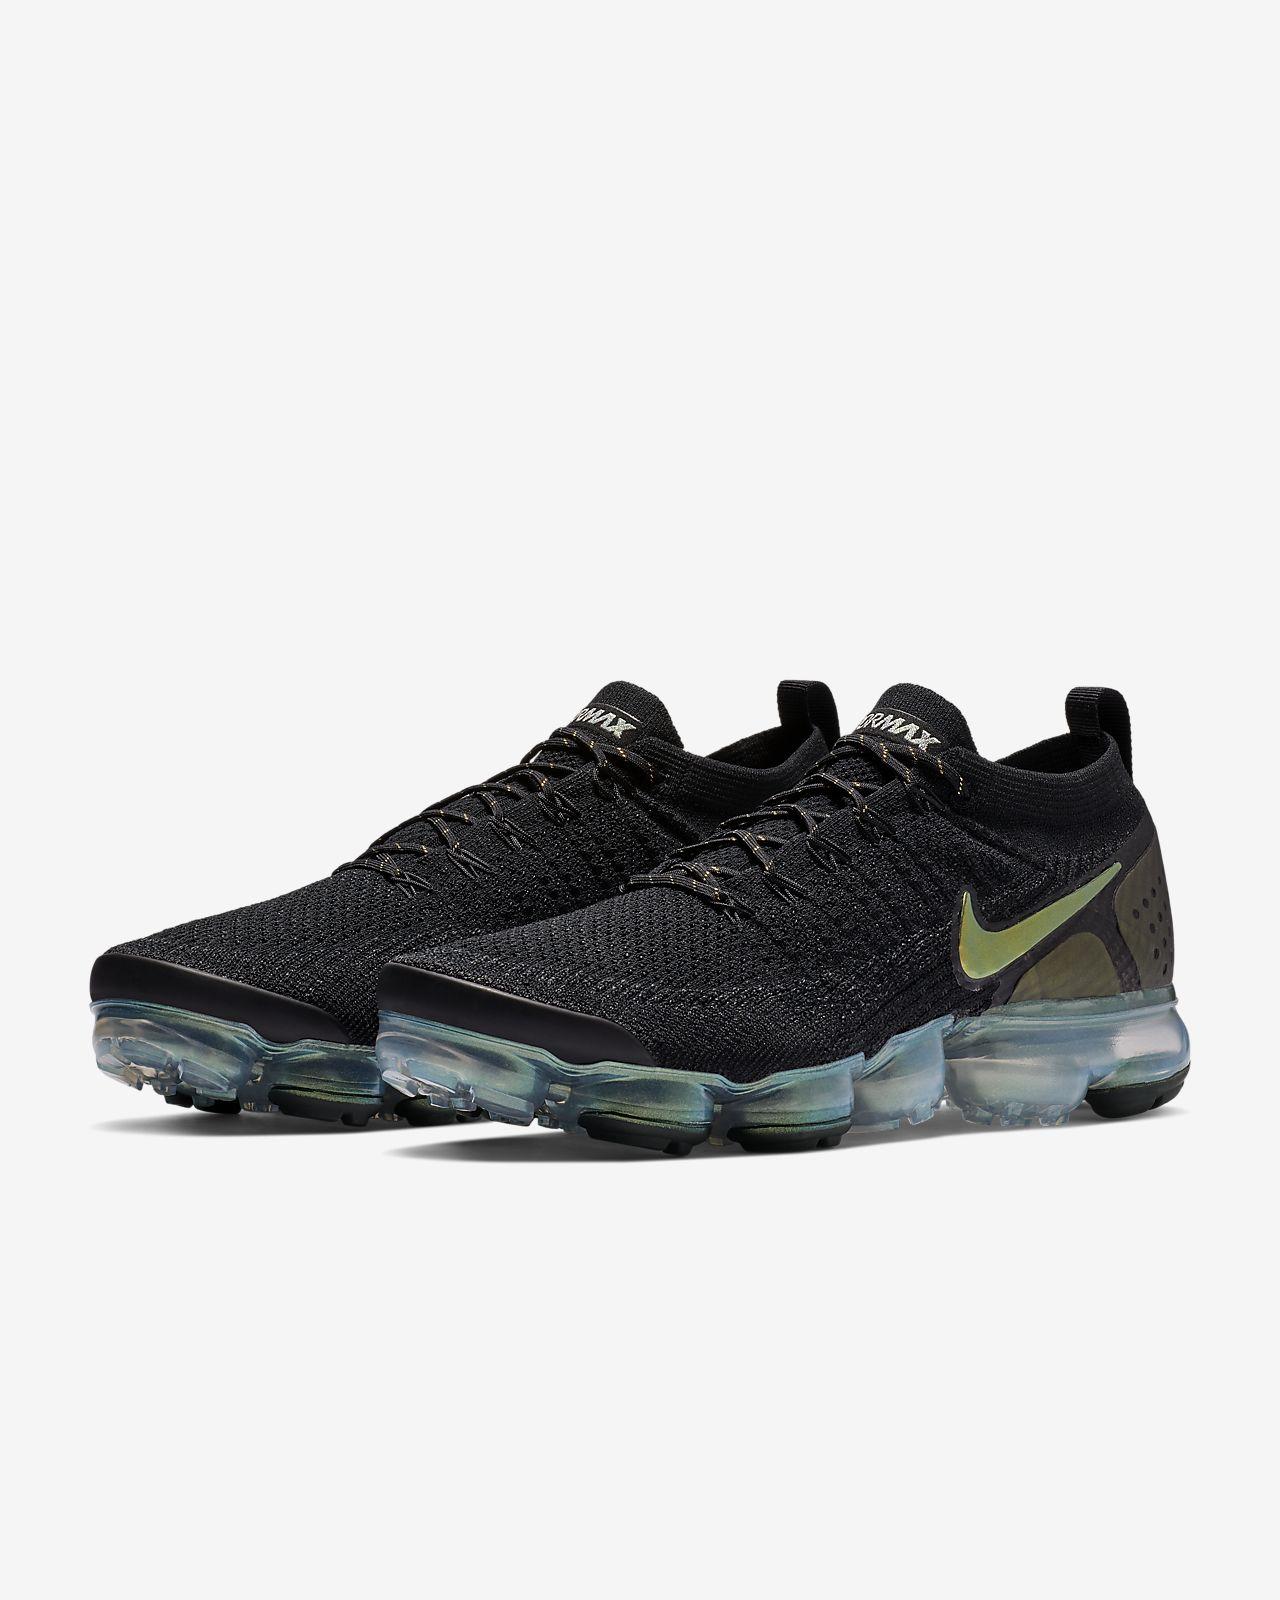 online store 585cd f399e ... Chaussure Nike Air VaporMax Flyknit 2